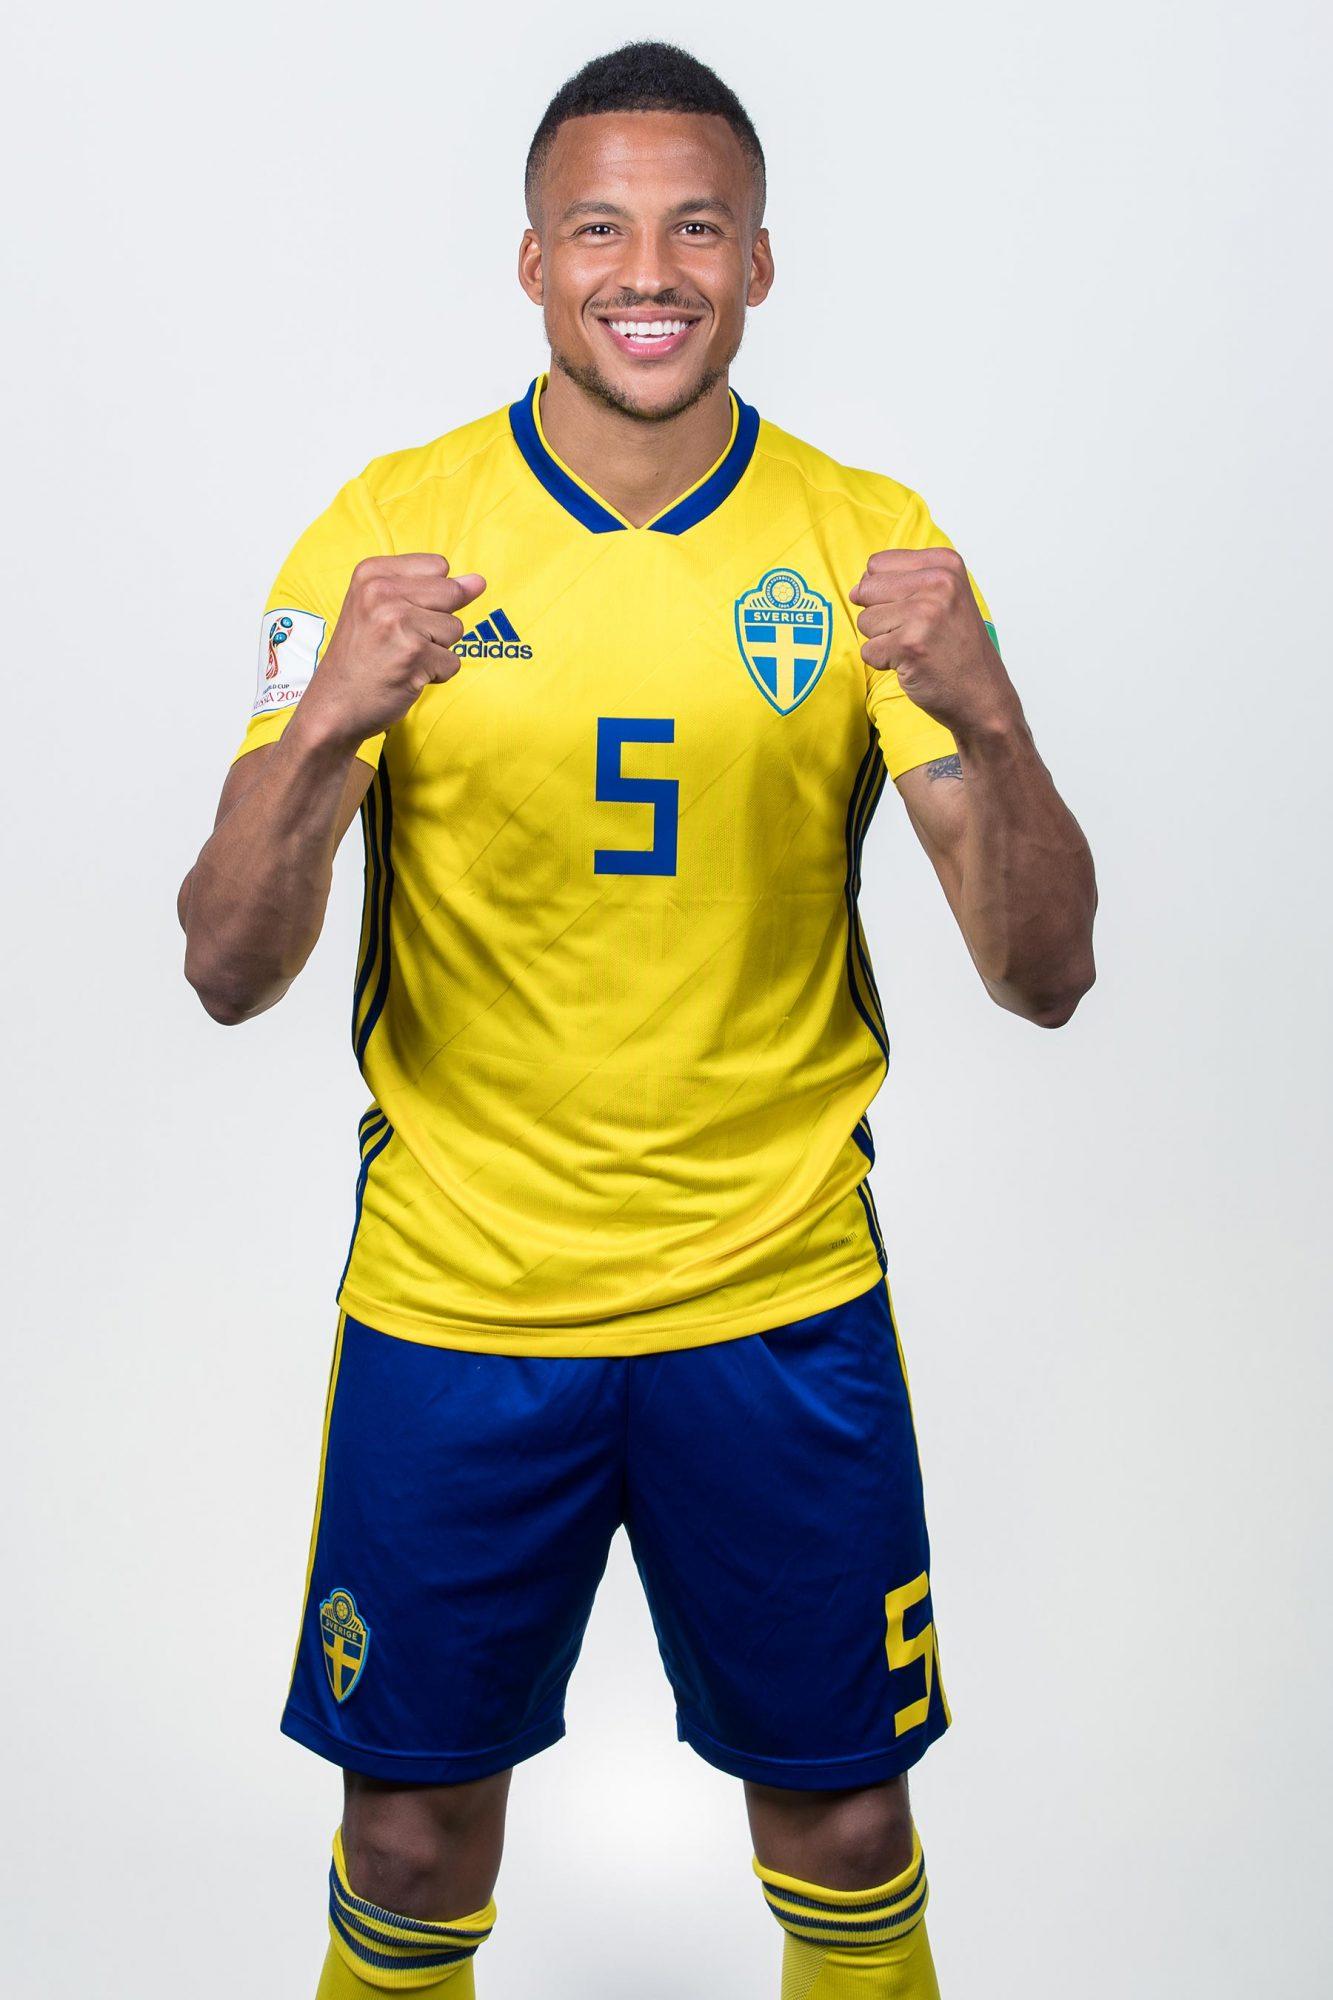 Sweden Portraits - 2018 FIFA World Cup Russia